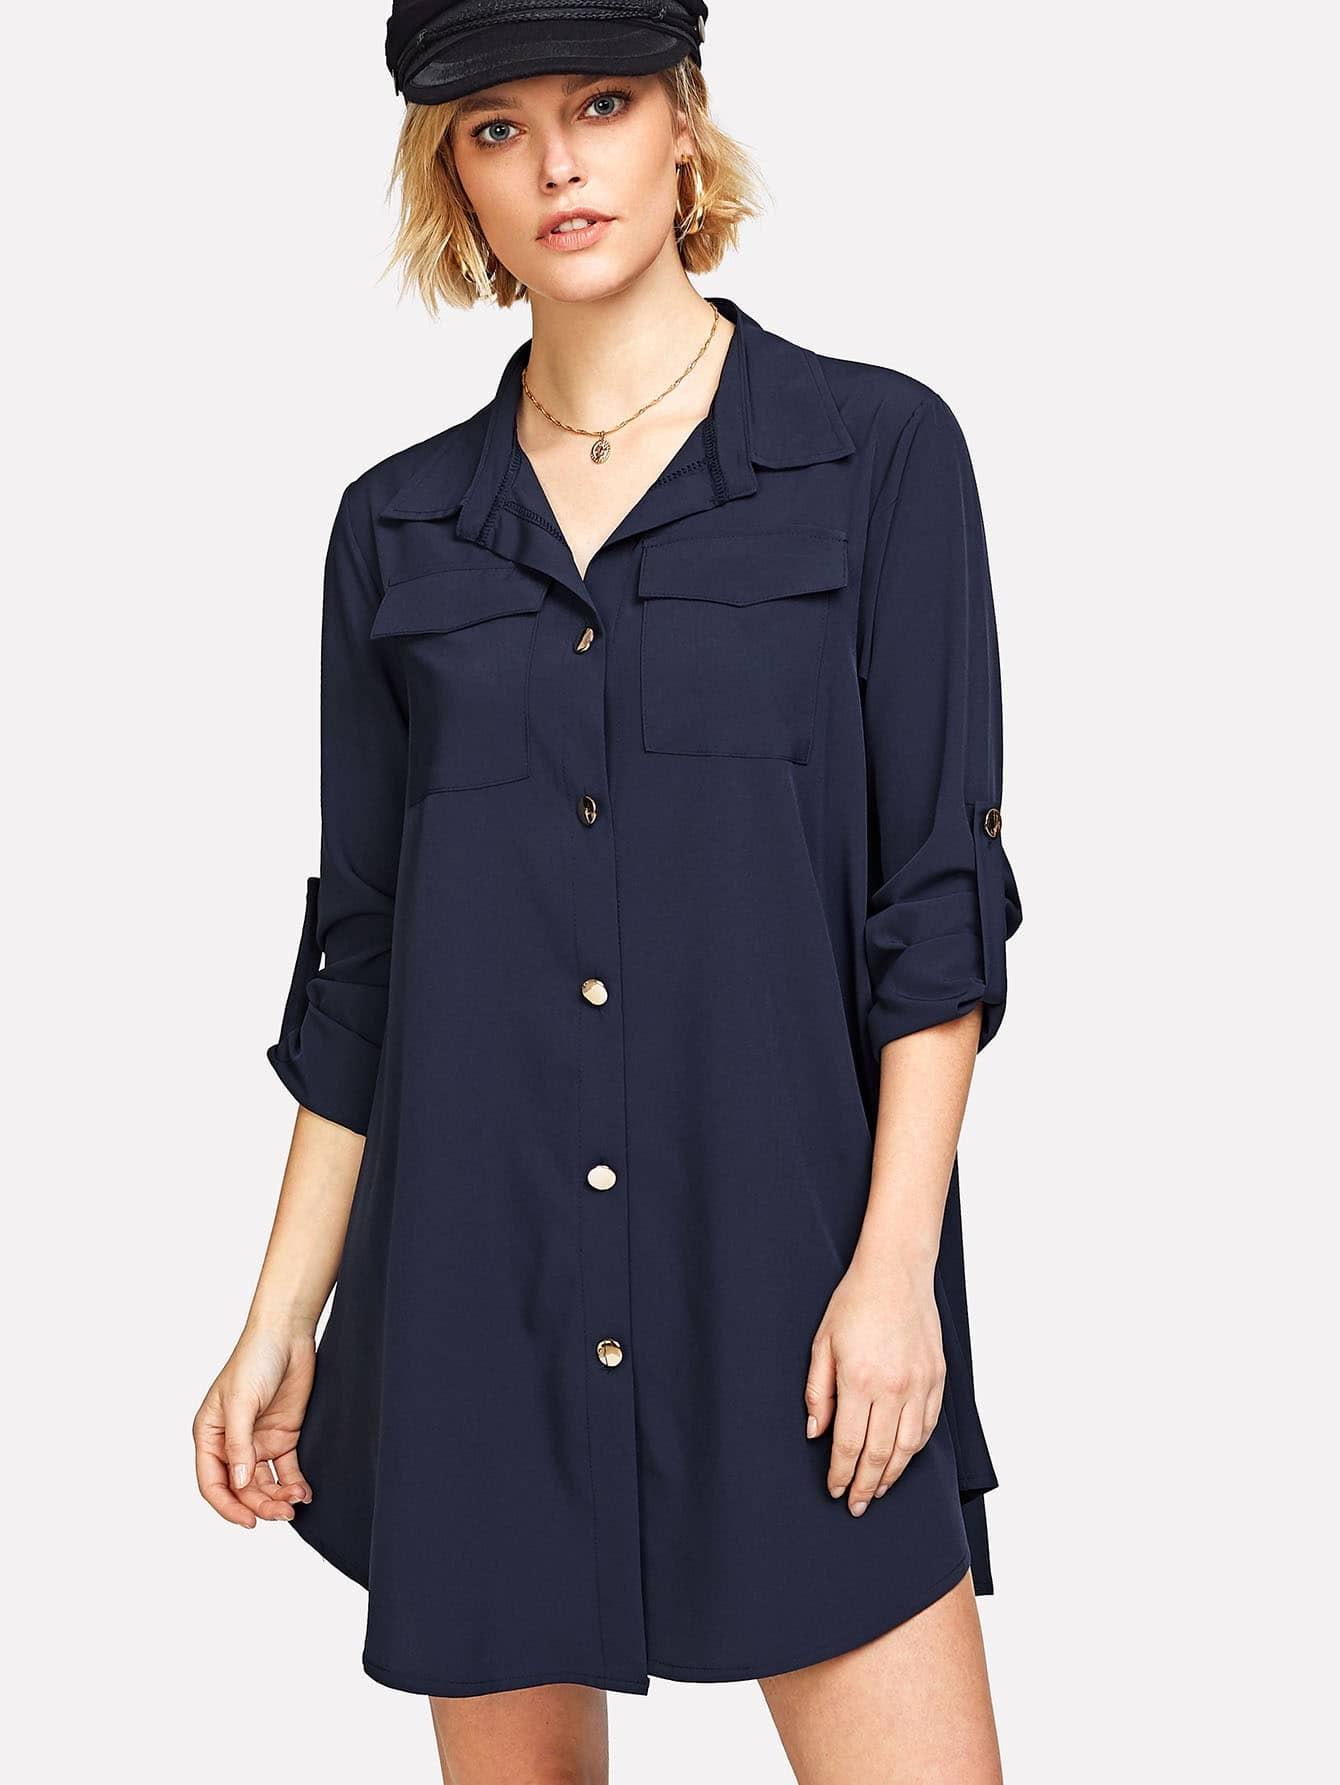 Roll Tab Sleeve Curved Hem Shirt Dress gathered sleeve curved dip hem gingham dress